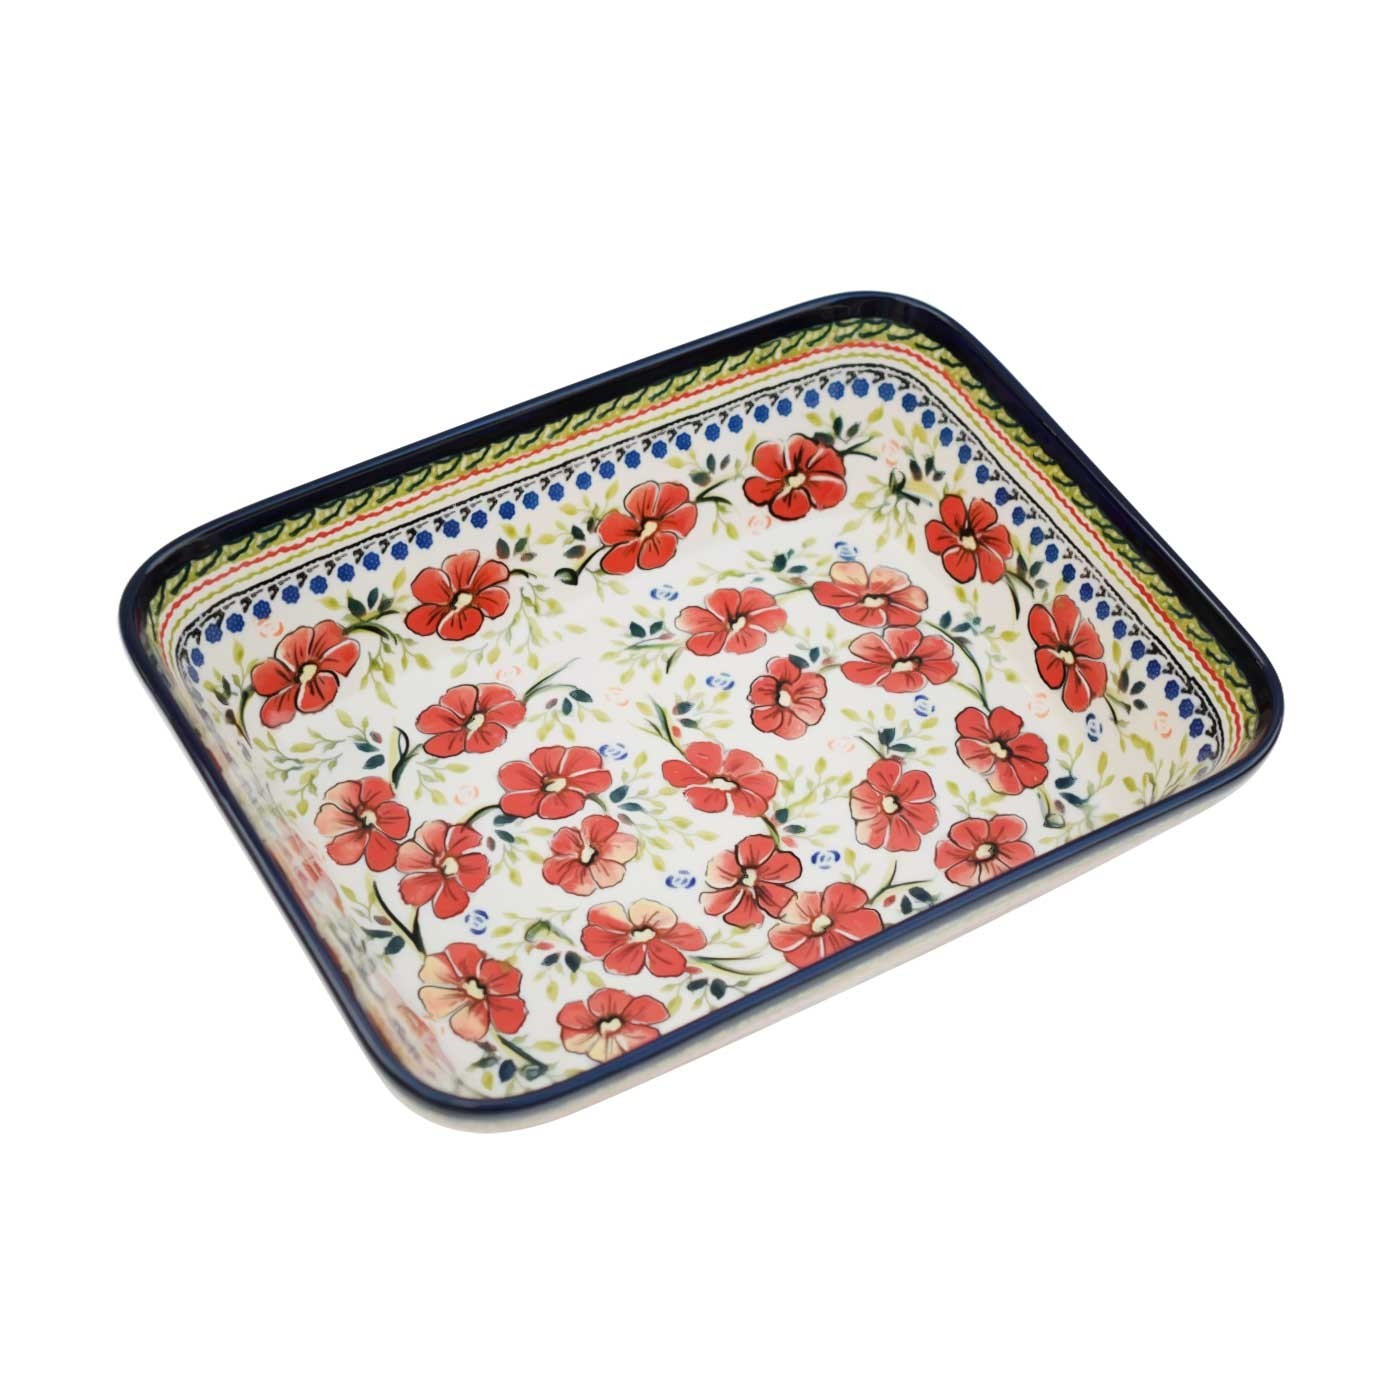 "Pottery Avenue 10"" x 12"" Rectangular Stoneware Bake-n Serve Baker - 1351-252EX Love Blossoms"